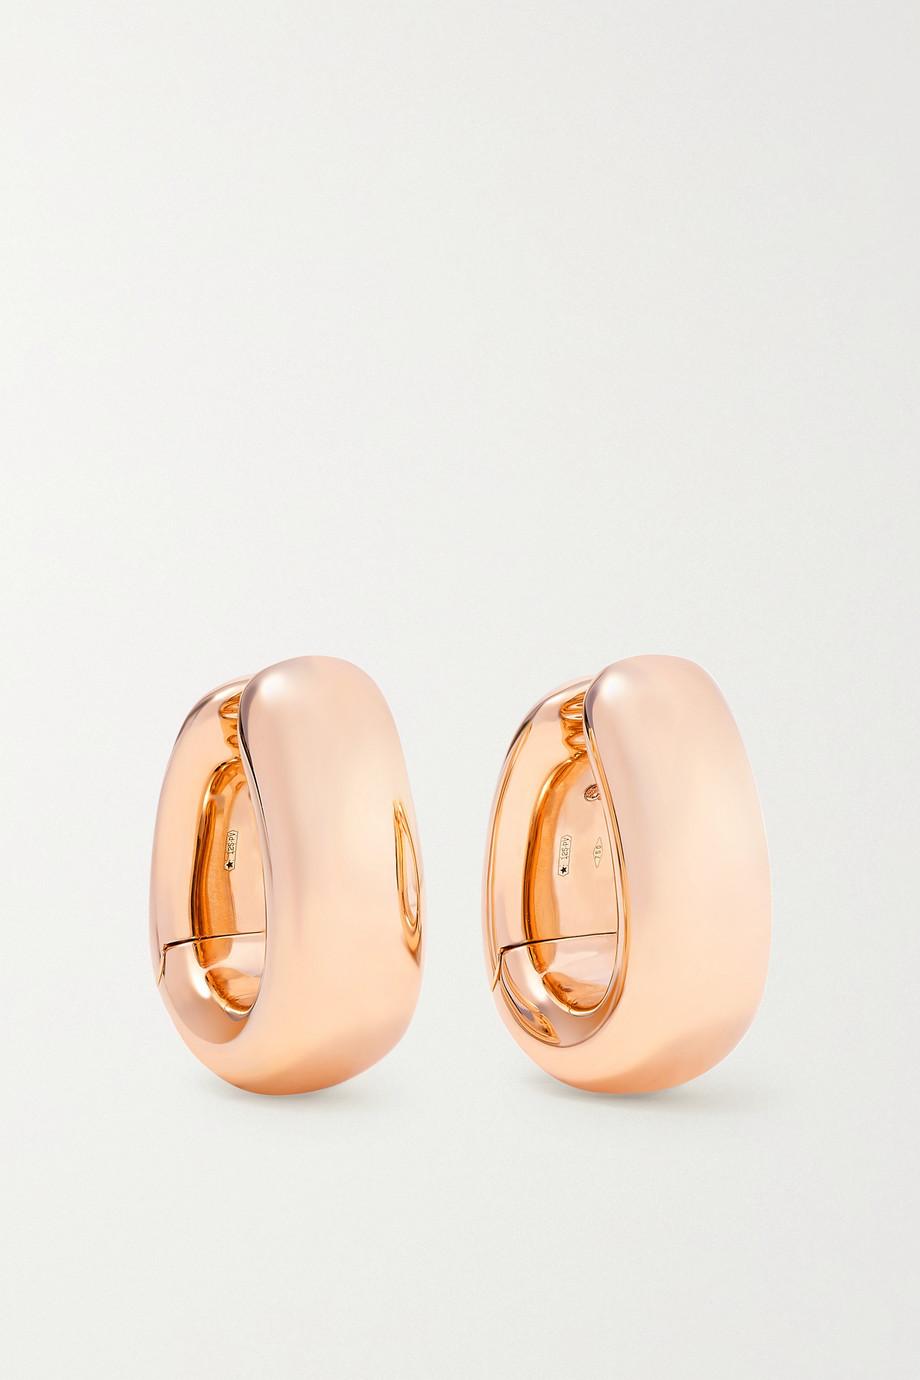 Pomellato Boucles d'oreilles en or rose 18 carats Iconica